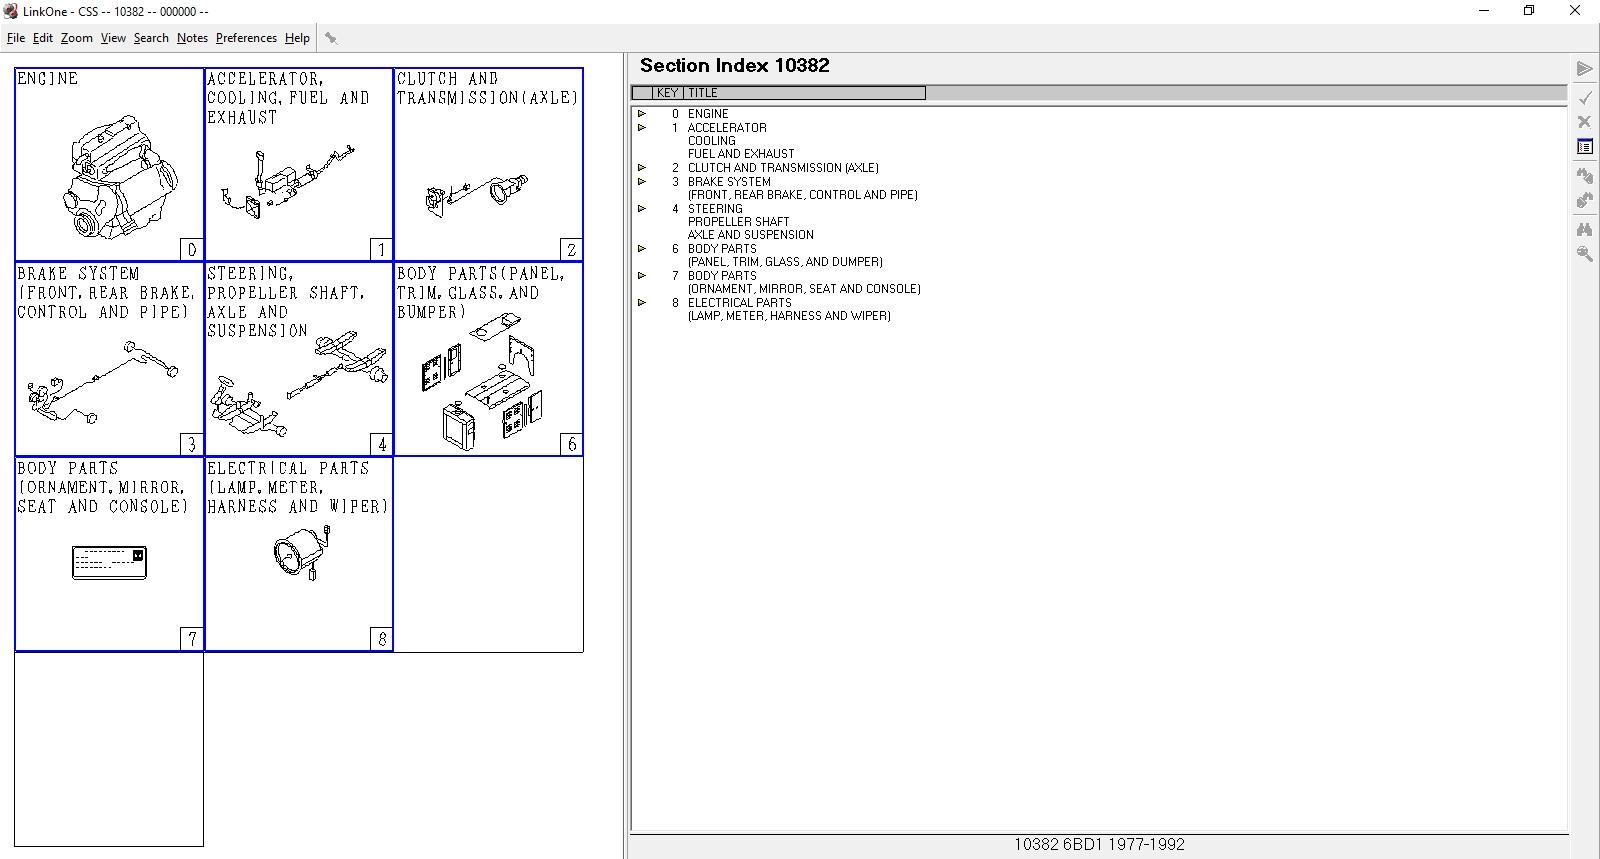 ISUZU_CSS-NET_EPC_052020_Electronic_Parts_Catalog_2